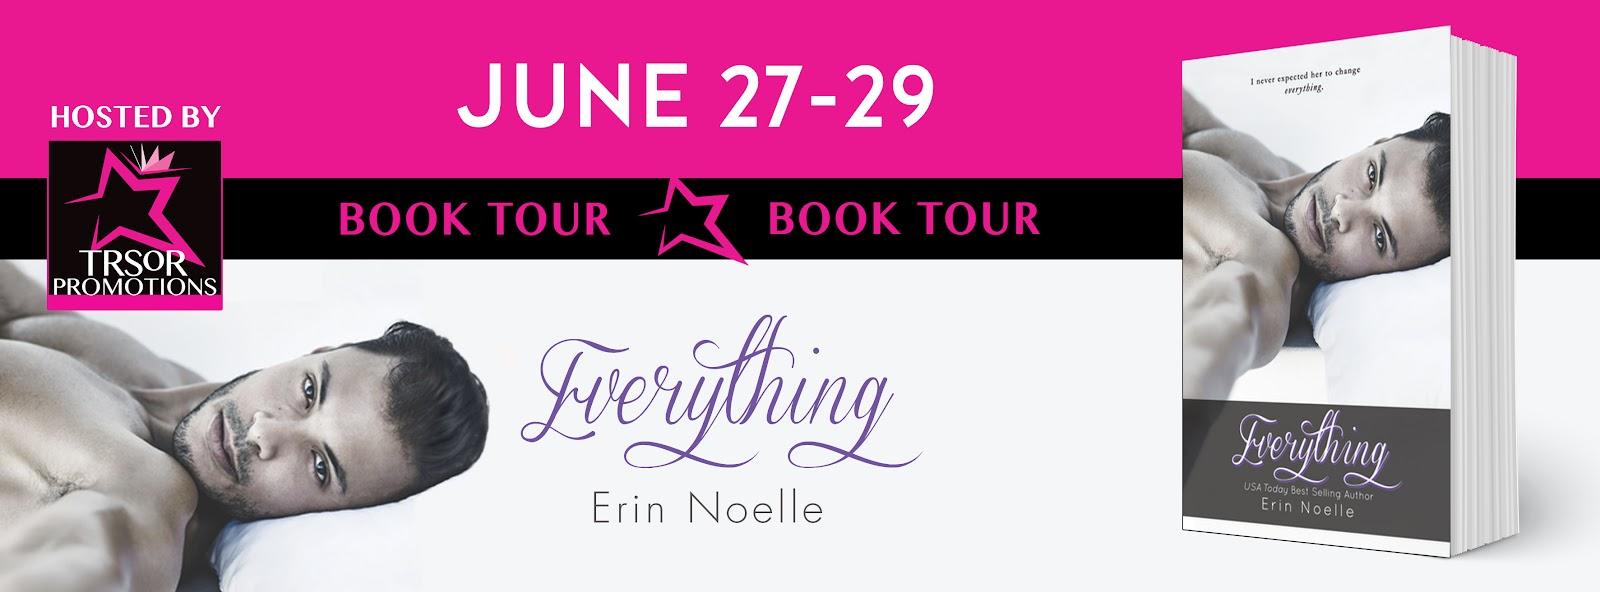 EVERYTHING_BOOK_TOUR.jpg